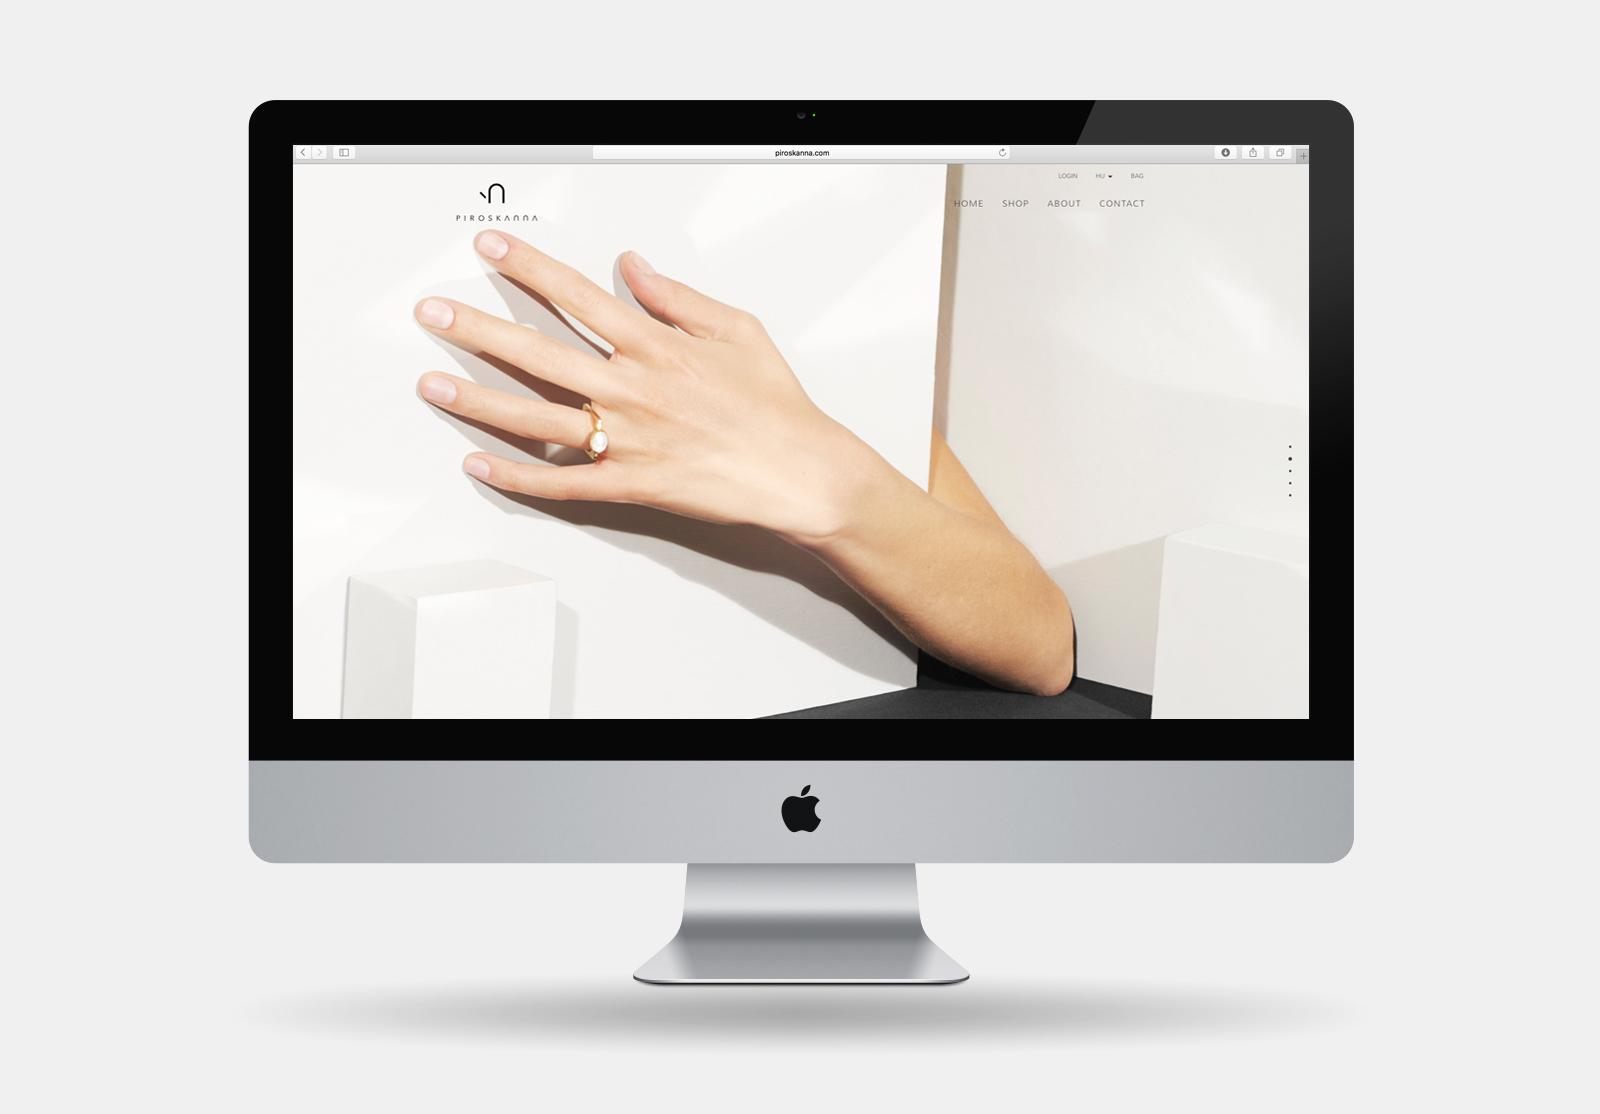 Apple-iMac-271 1.jpg